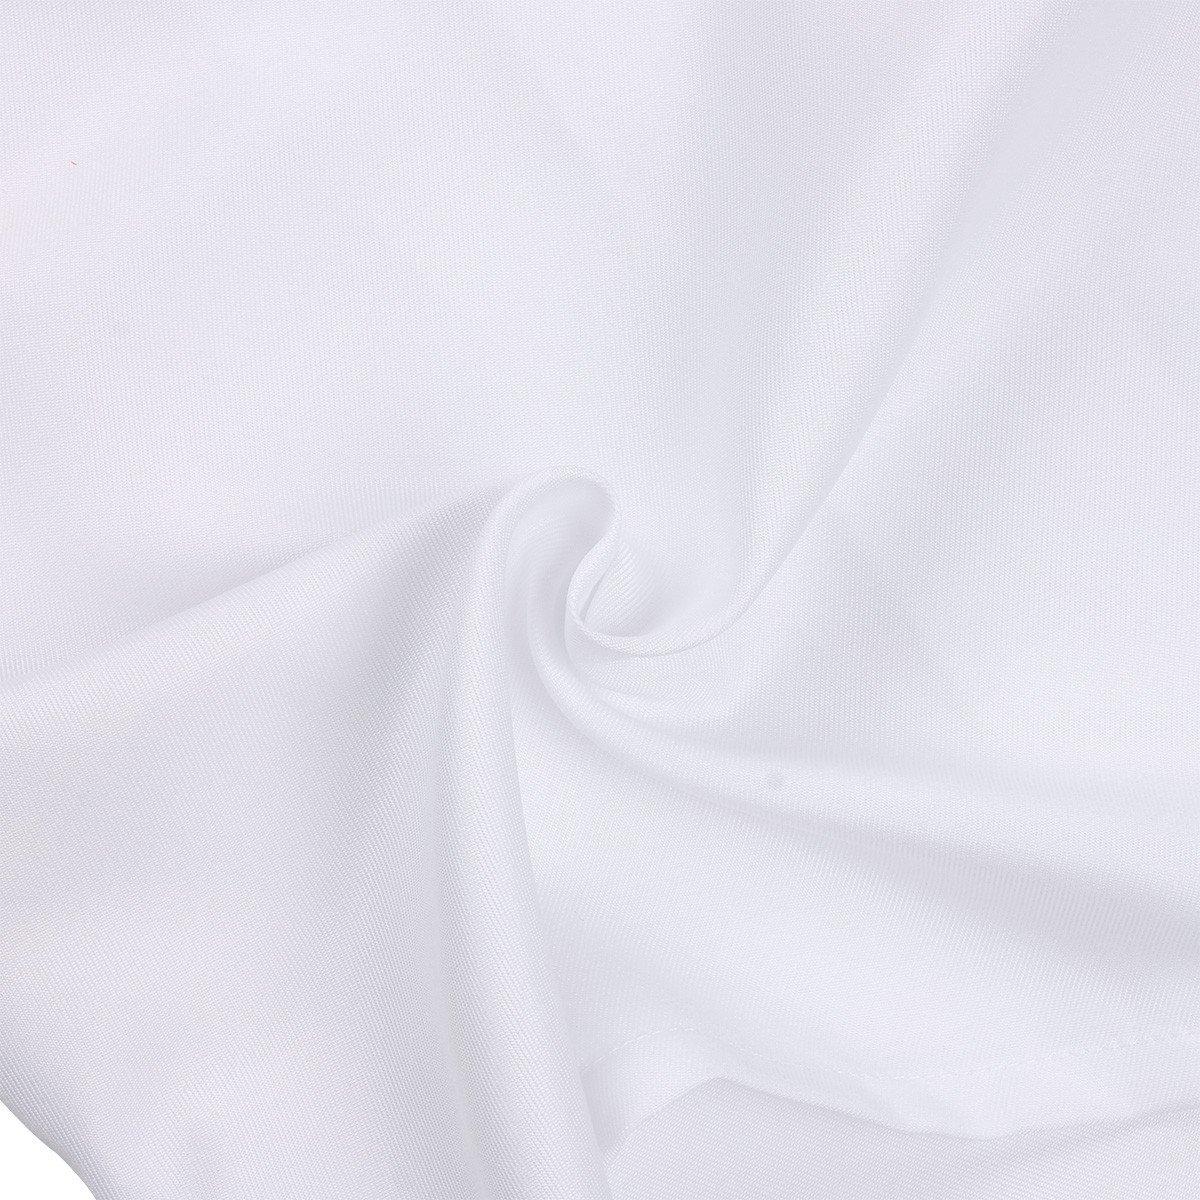 Freebily Scrubs Childrens Lab Coat-Soft Fabric Long Sleeve Doctor Uniform White Cosplay Dress up Costume White 4-5 by Freebily (Image #6)